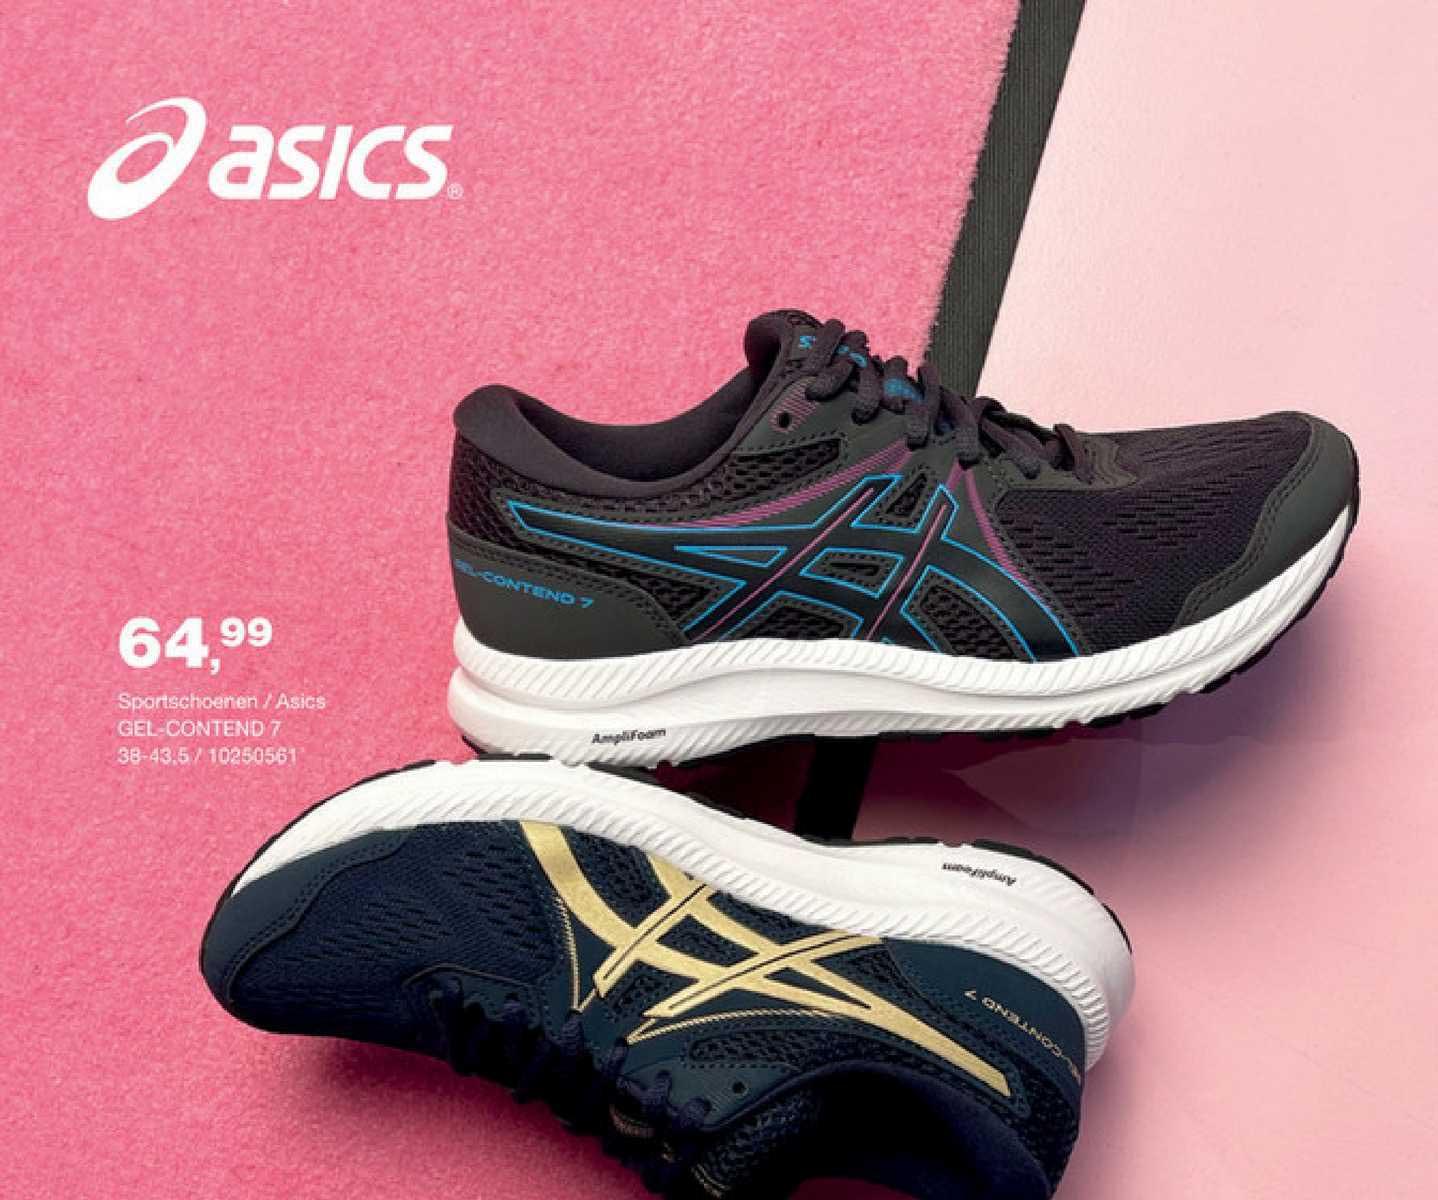 Bristol Sportschoenen - Asics Gel-Contend 7